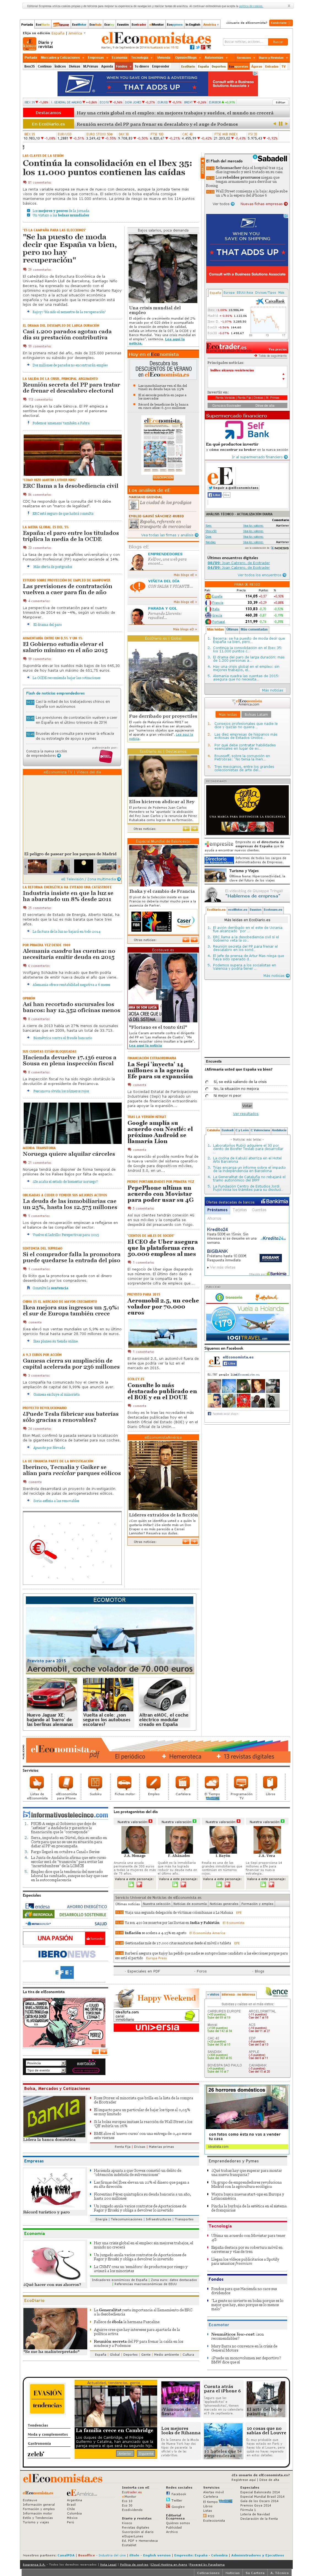 elEconomista at Tuesday Sept. 9, 2014, 2:05 p.m. UTC